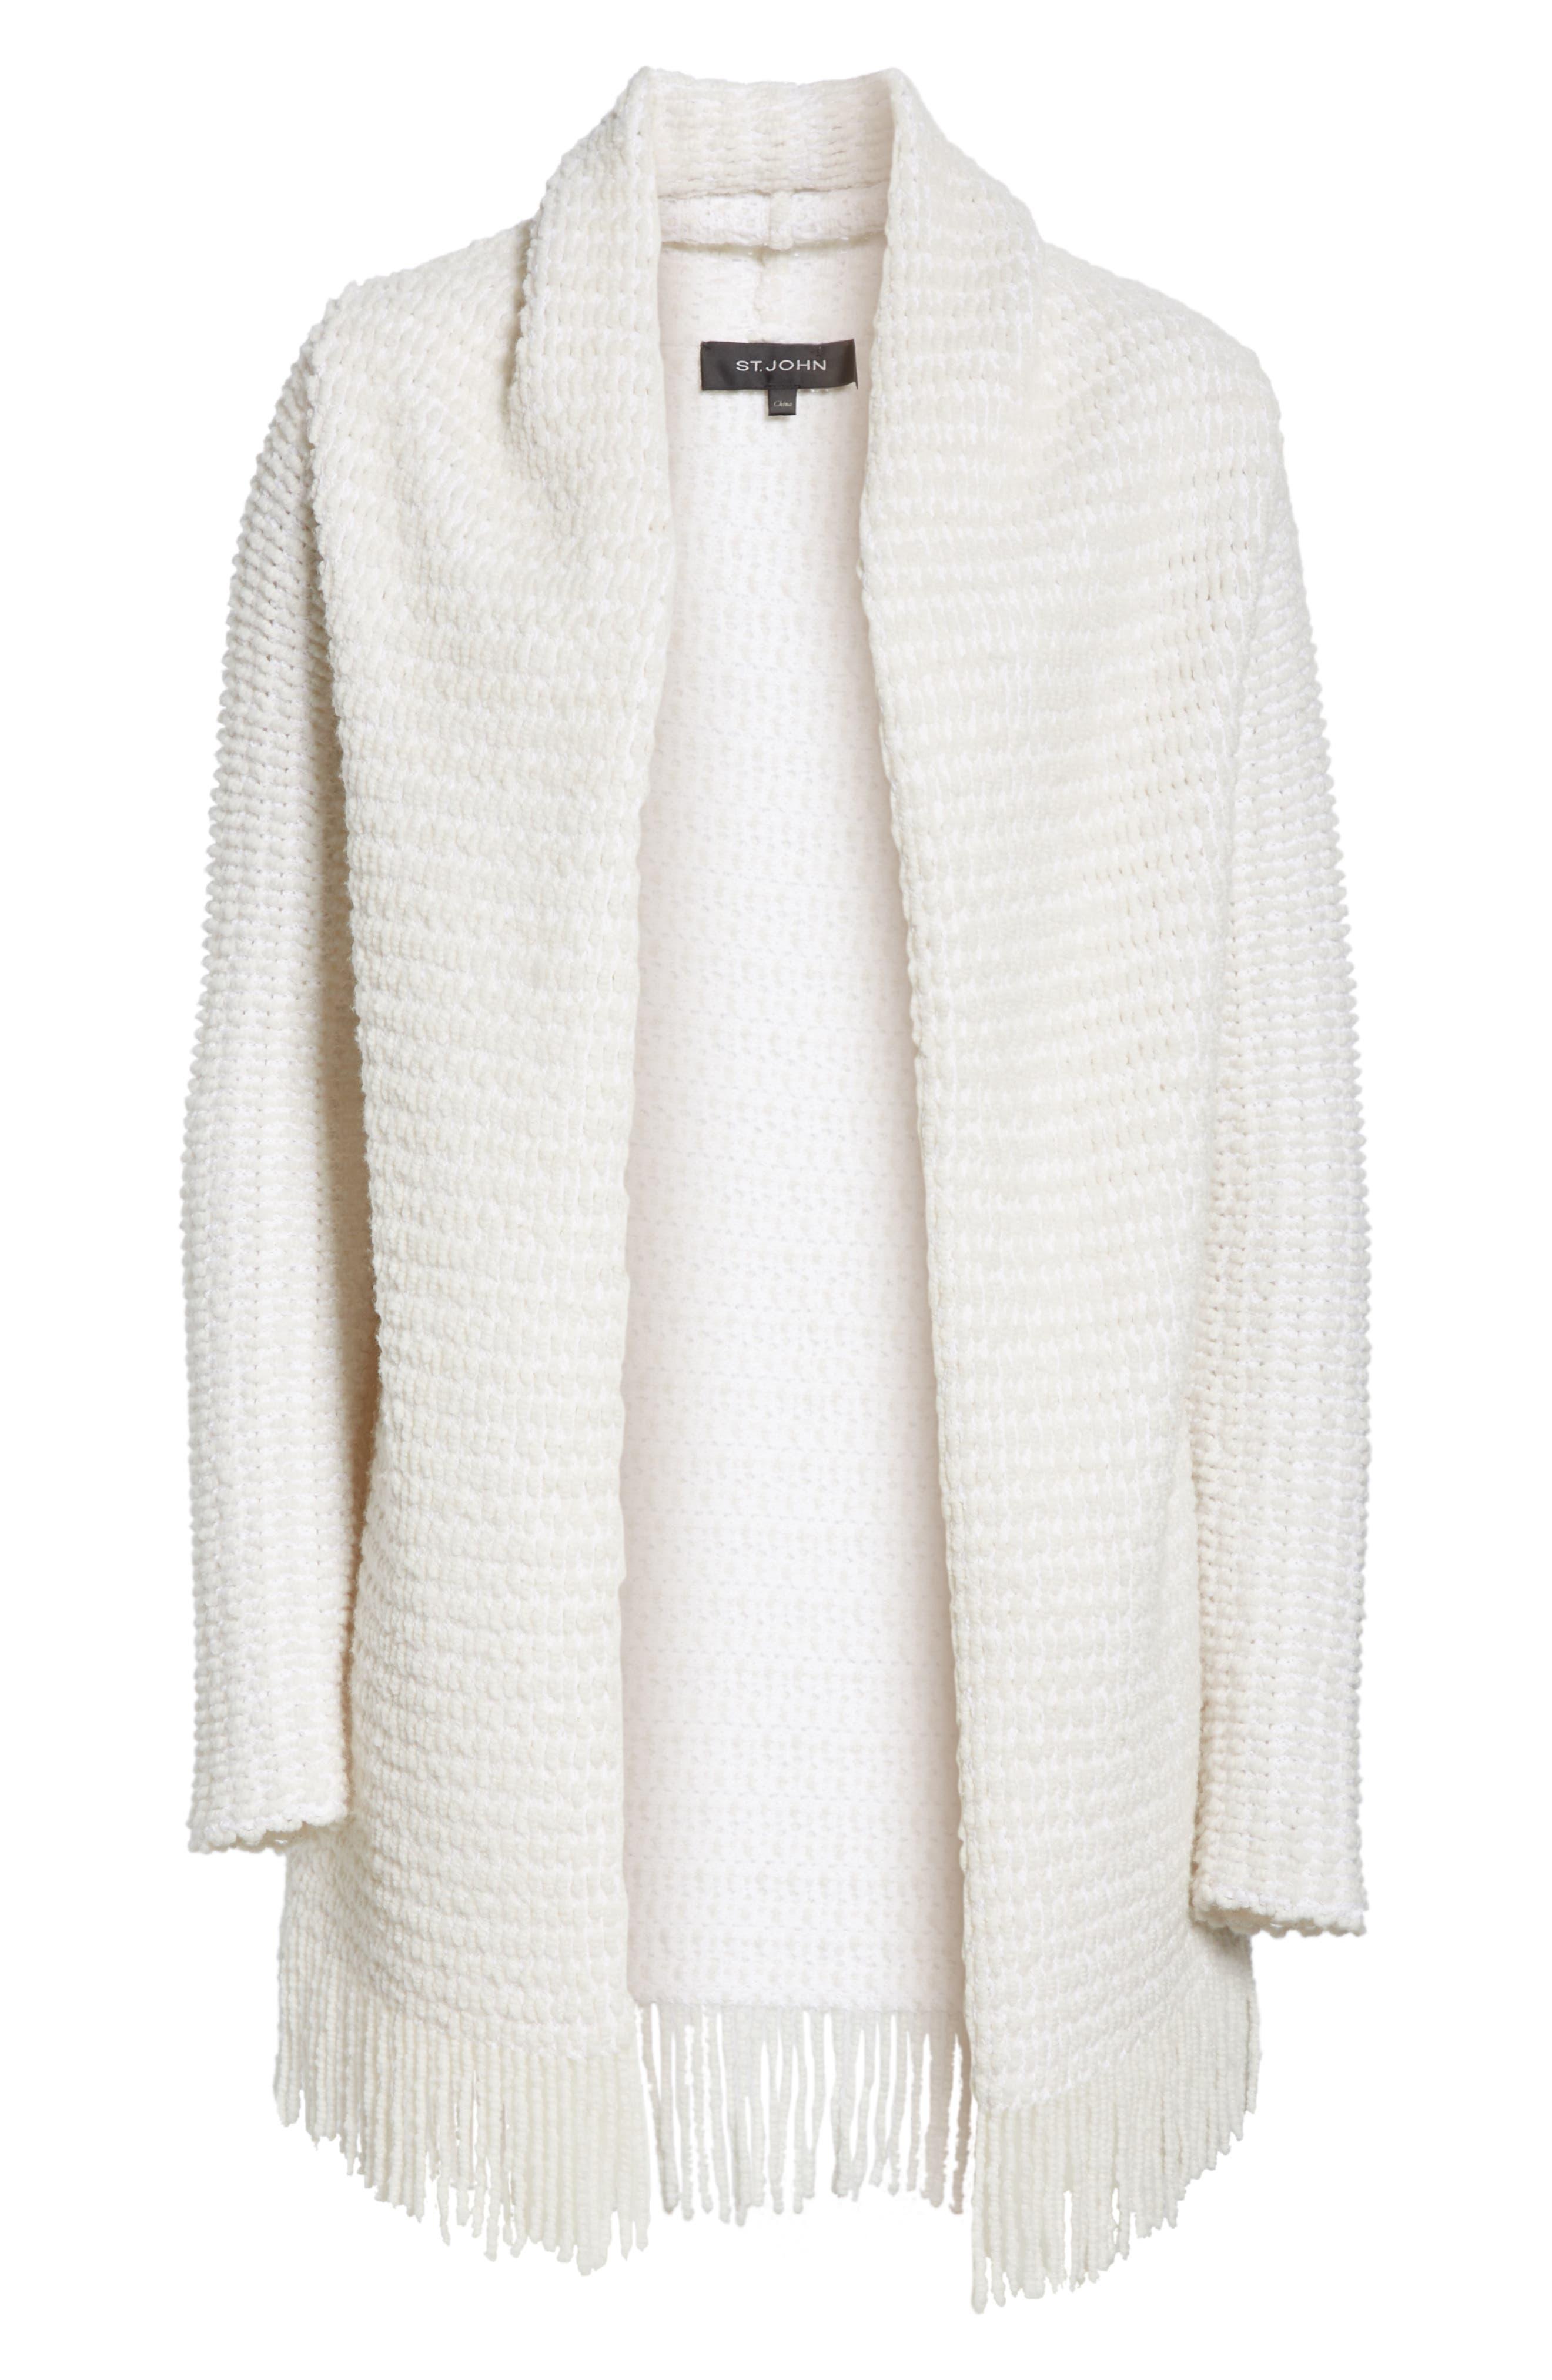 Textural Inlay Knit Cardigan,                             Alternate thumbnail 6, color,                             250